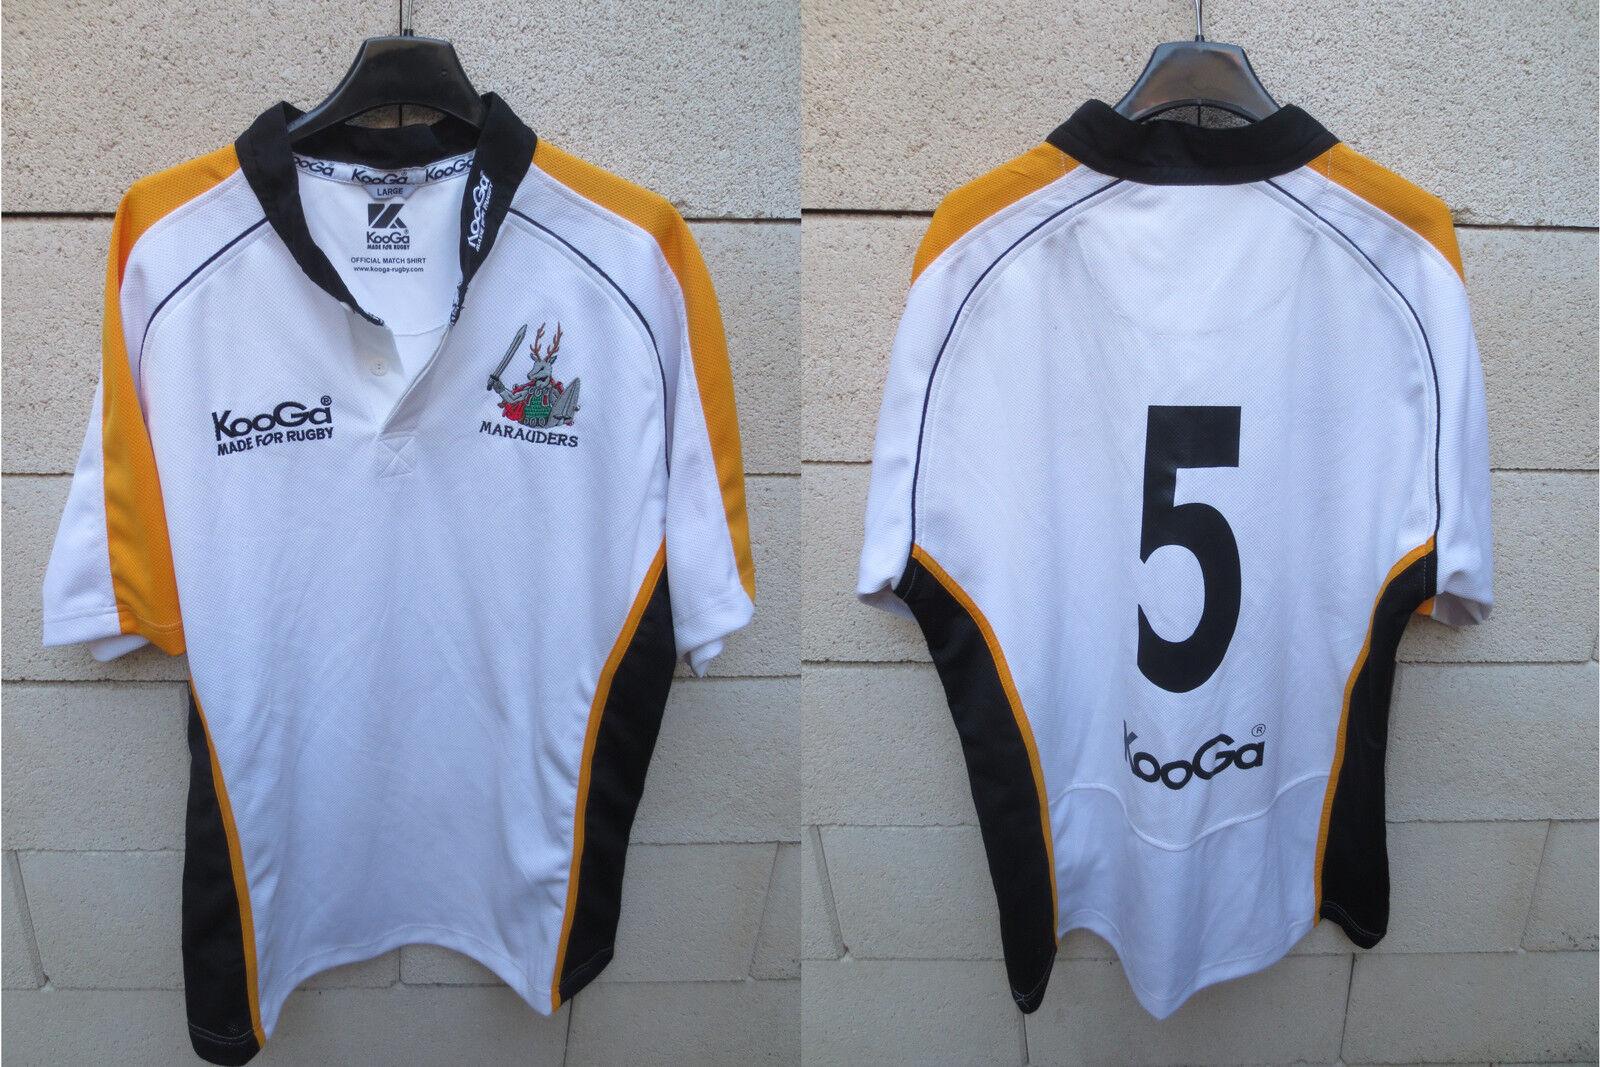 Maillot rugby porté n°5 WOODEN SPOON MARAUDERS Kooga official match worn shirt L